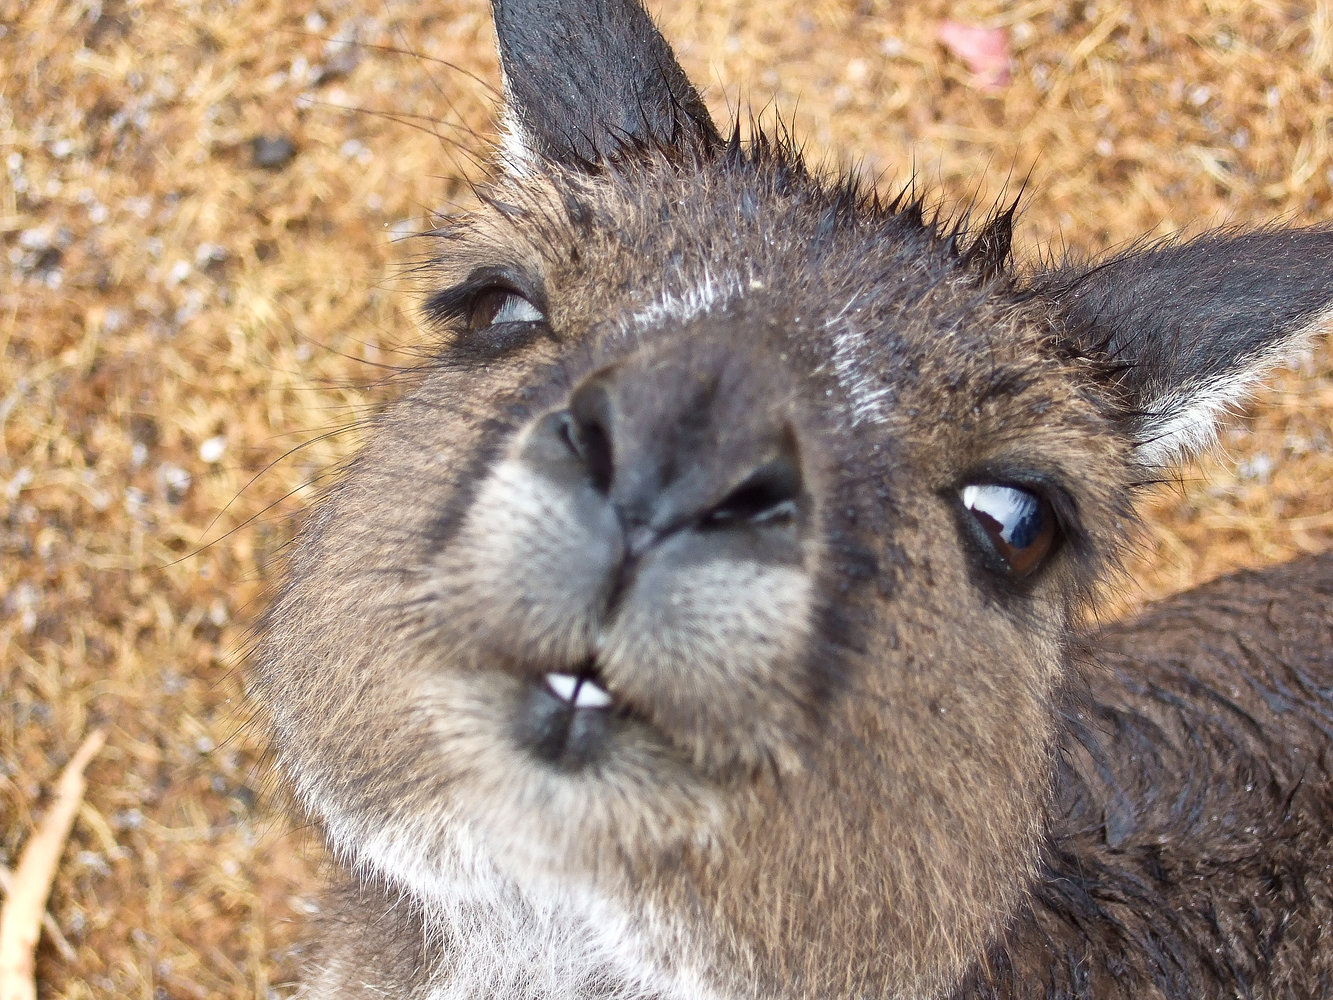 Kangeroo - Australia